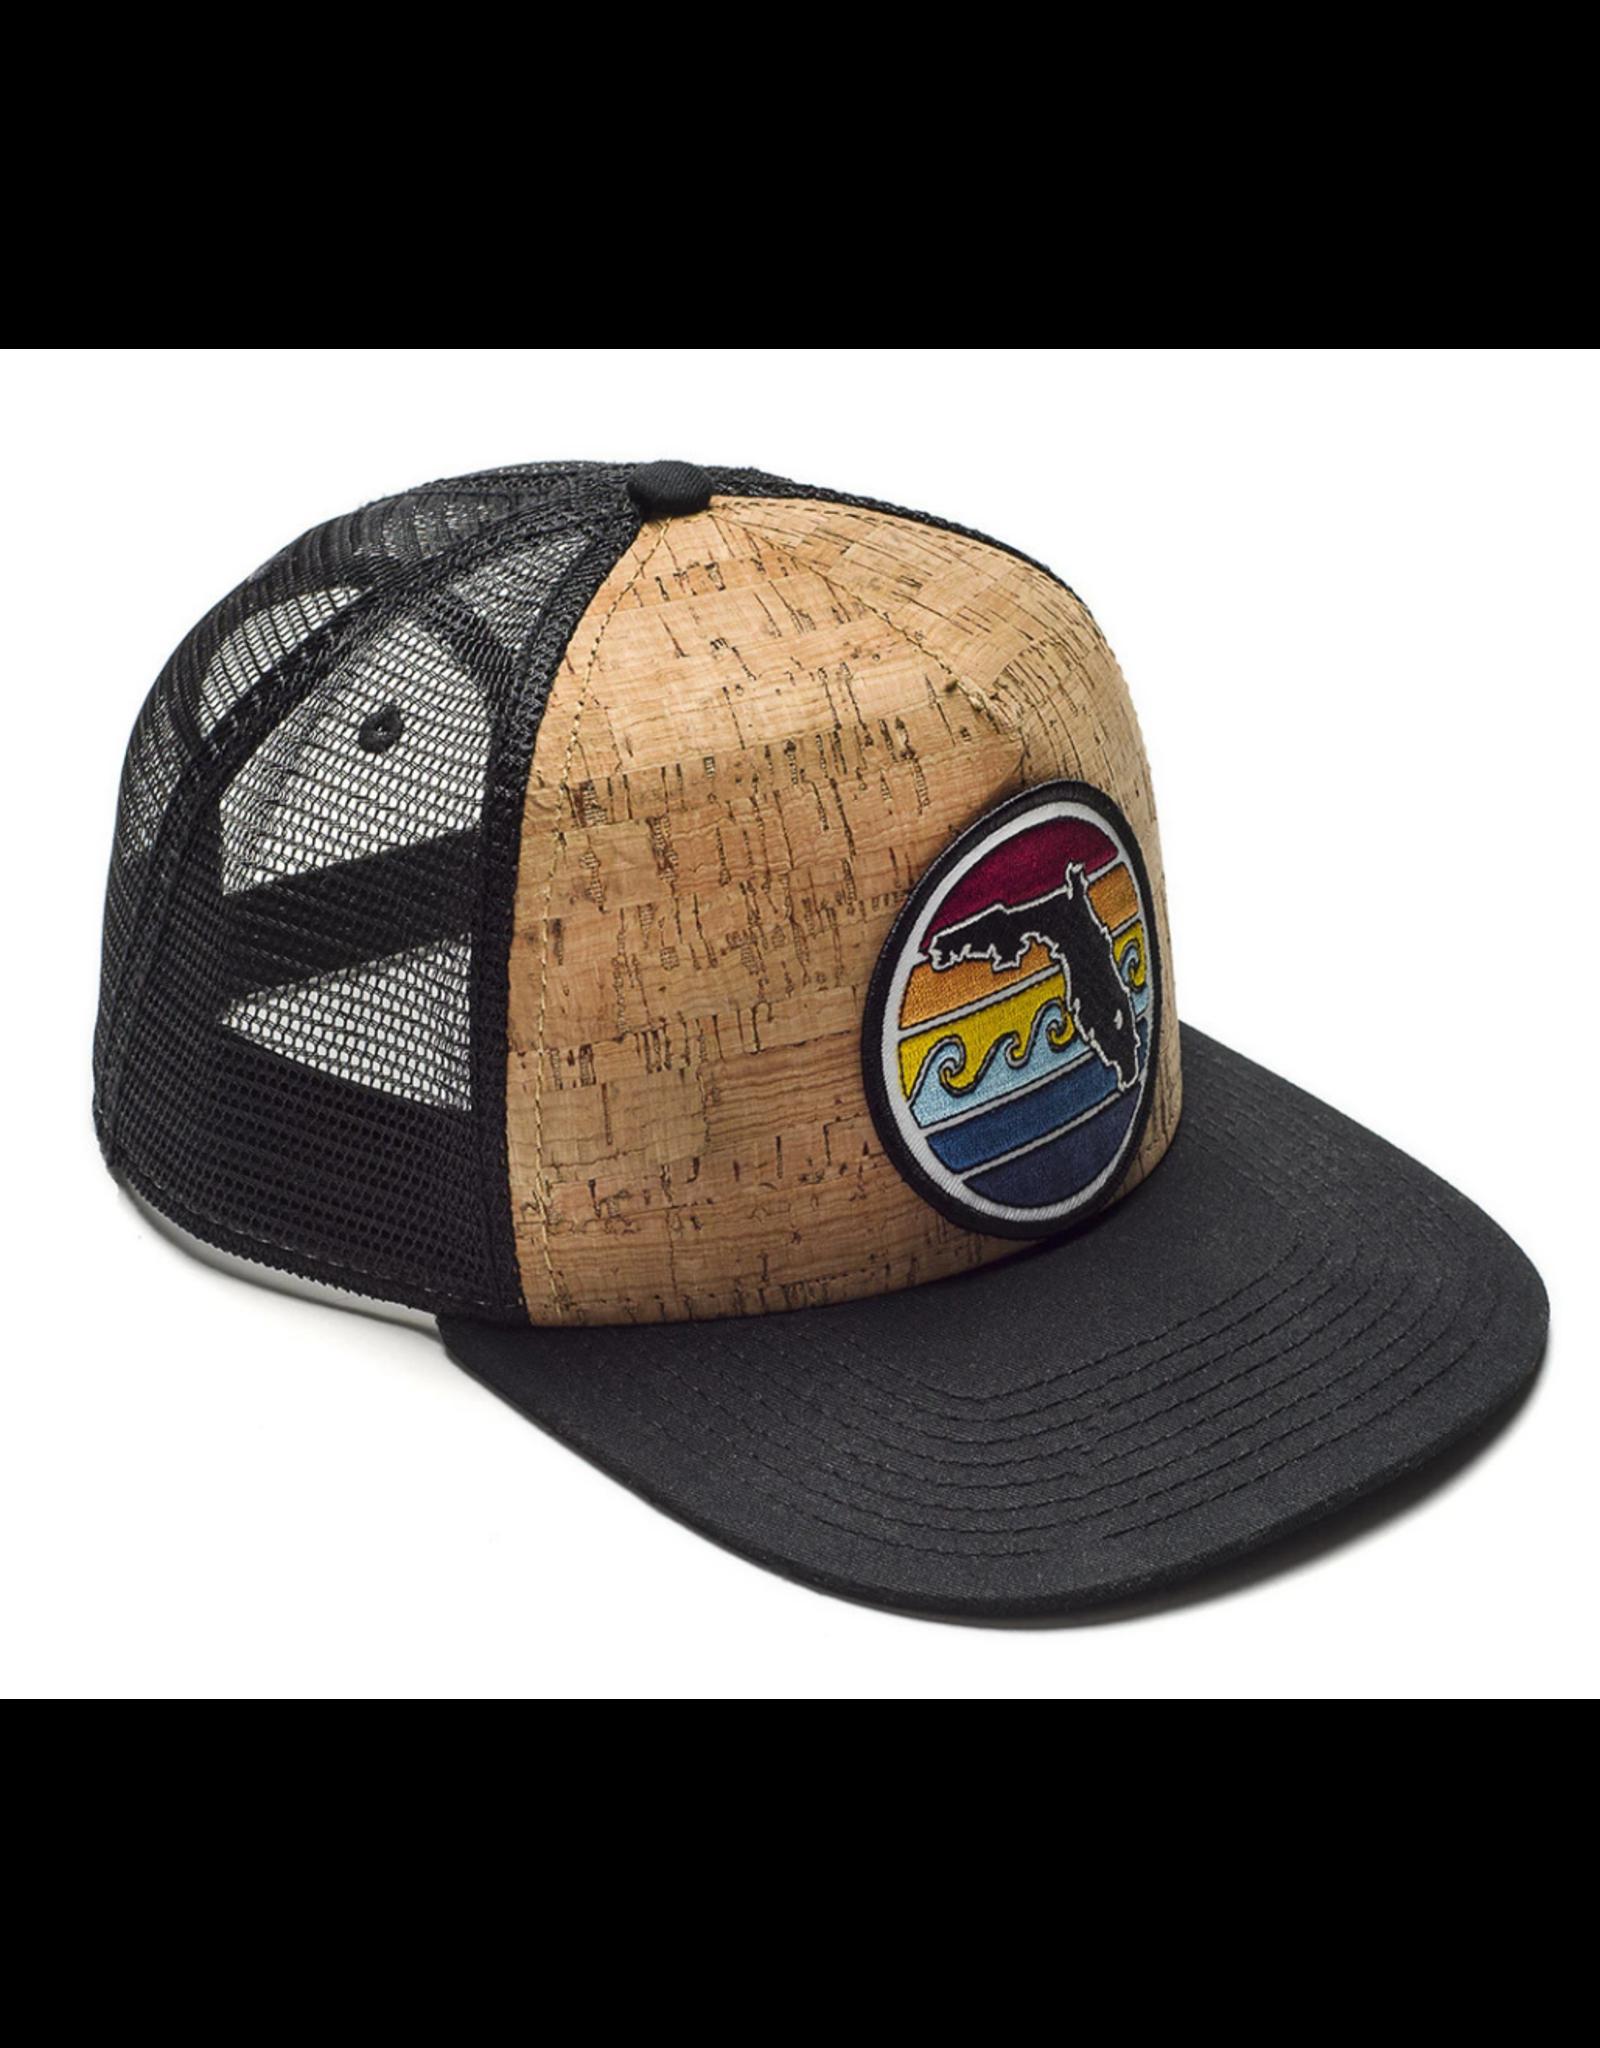 Sunshine State Goods Hat - Florida Sunset Trucker - Cork [SS]